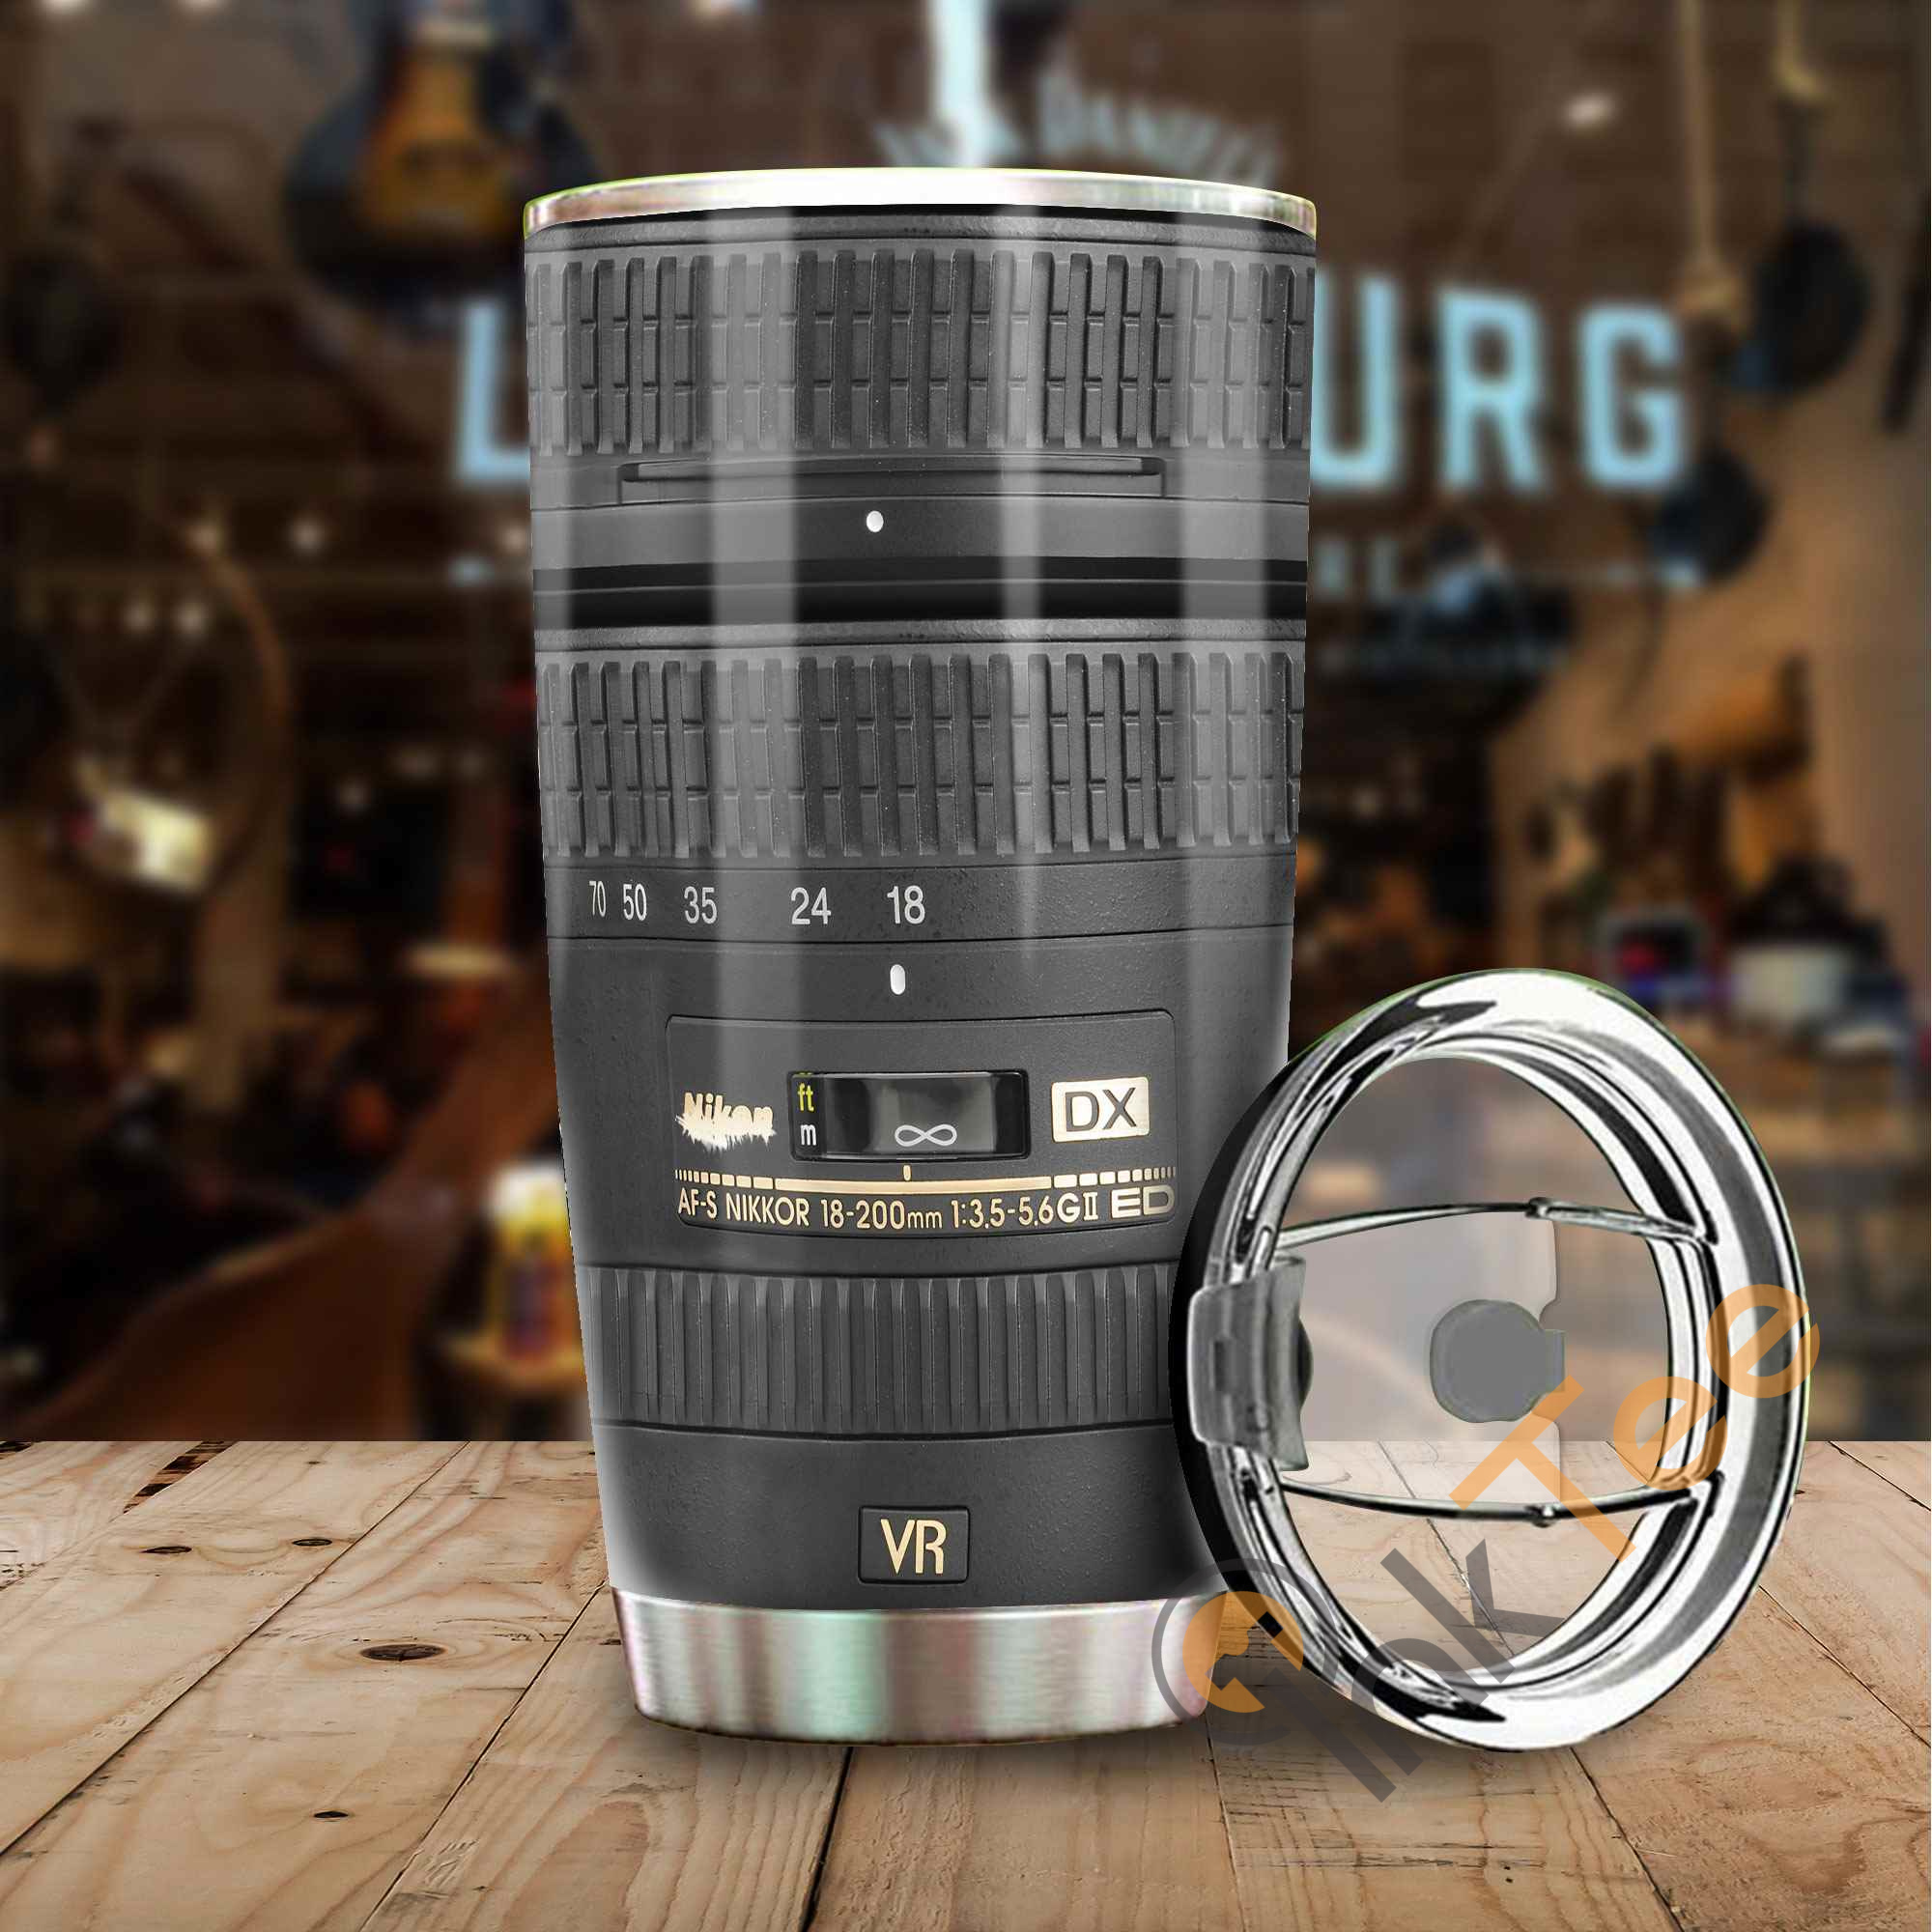 Love Camera Amazon Best Seller Sku 2908 Stainless Steel Tumbler